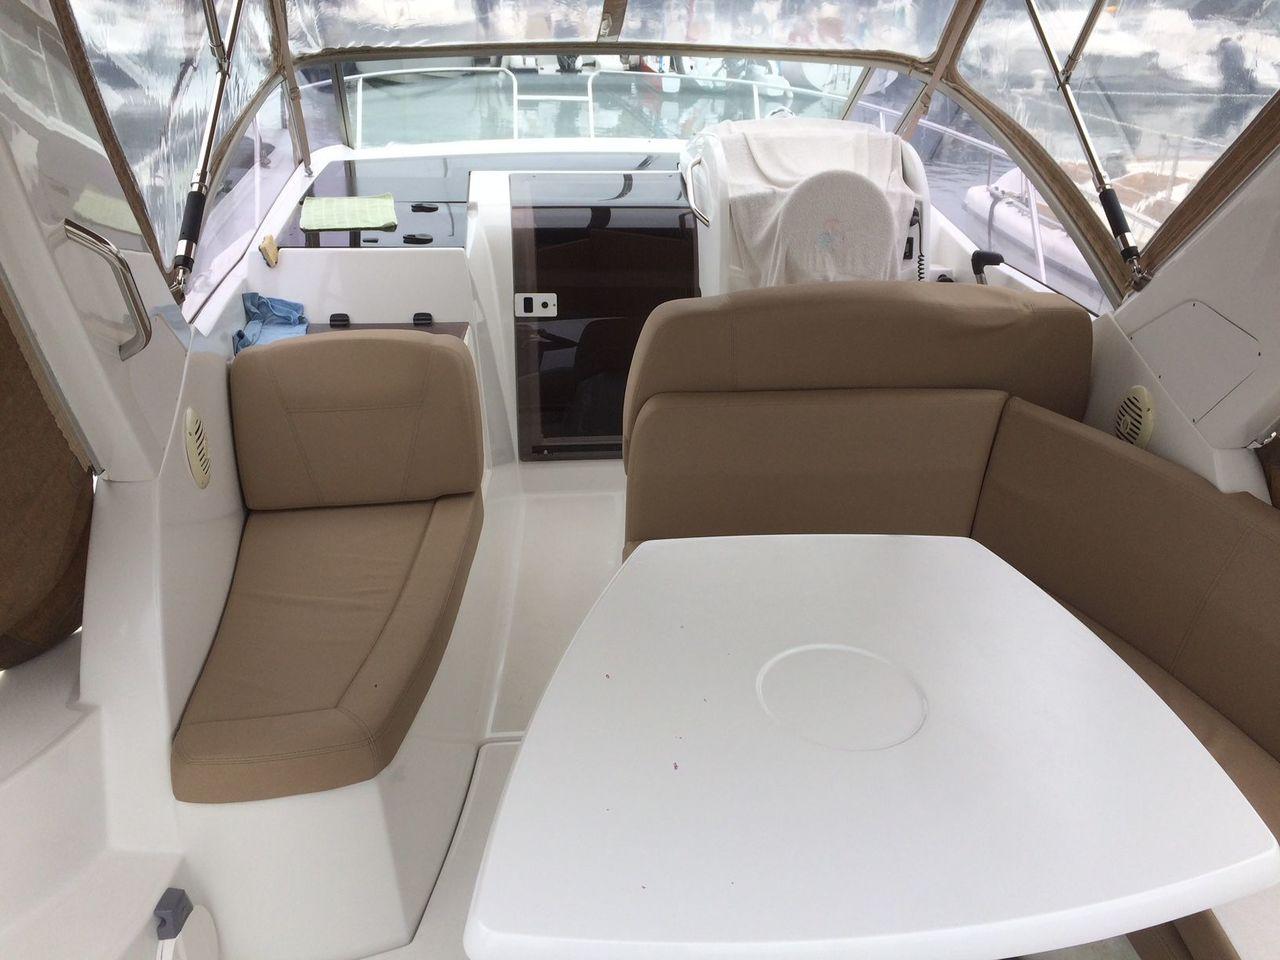 bateau inboard occasion jeanneau leader 8 en vente  u00e0